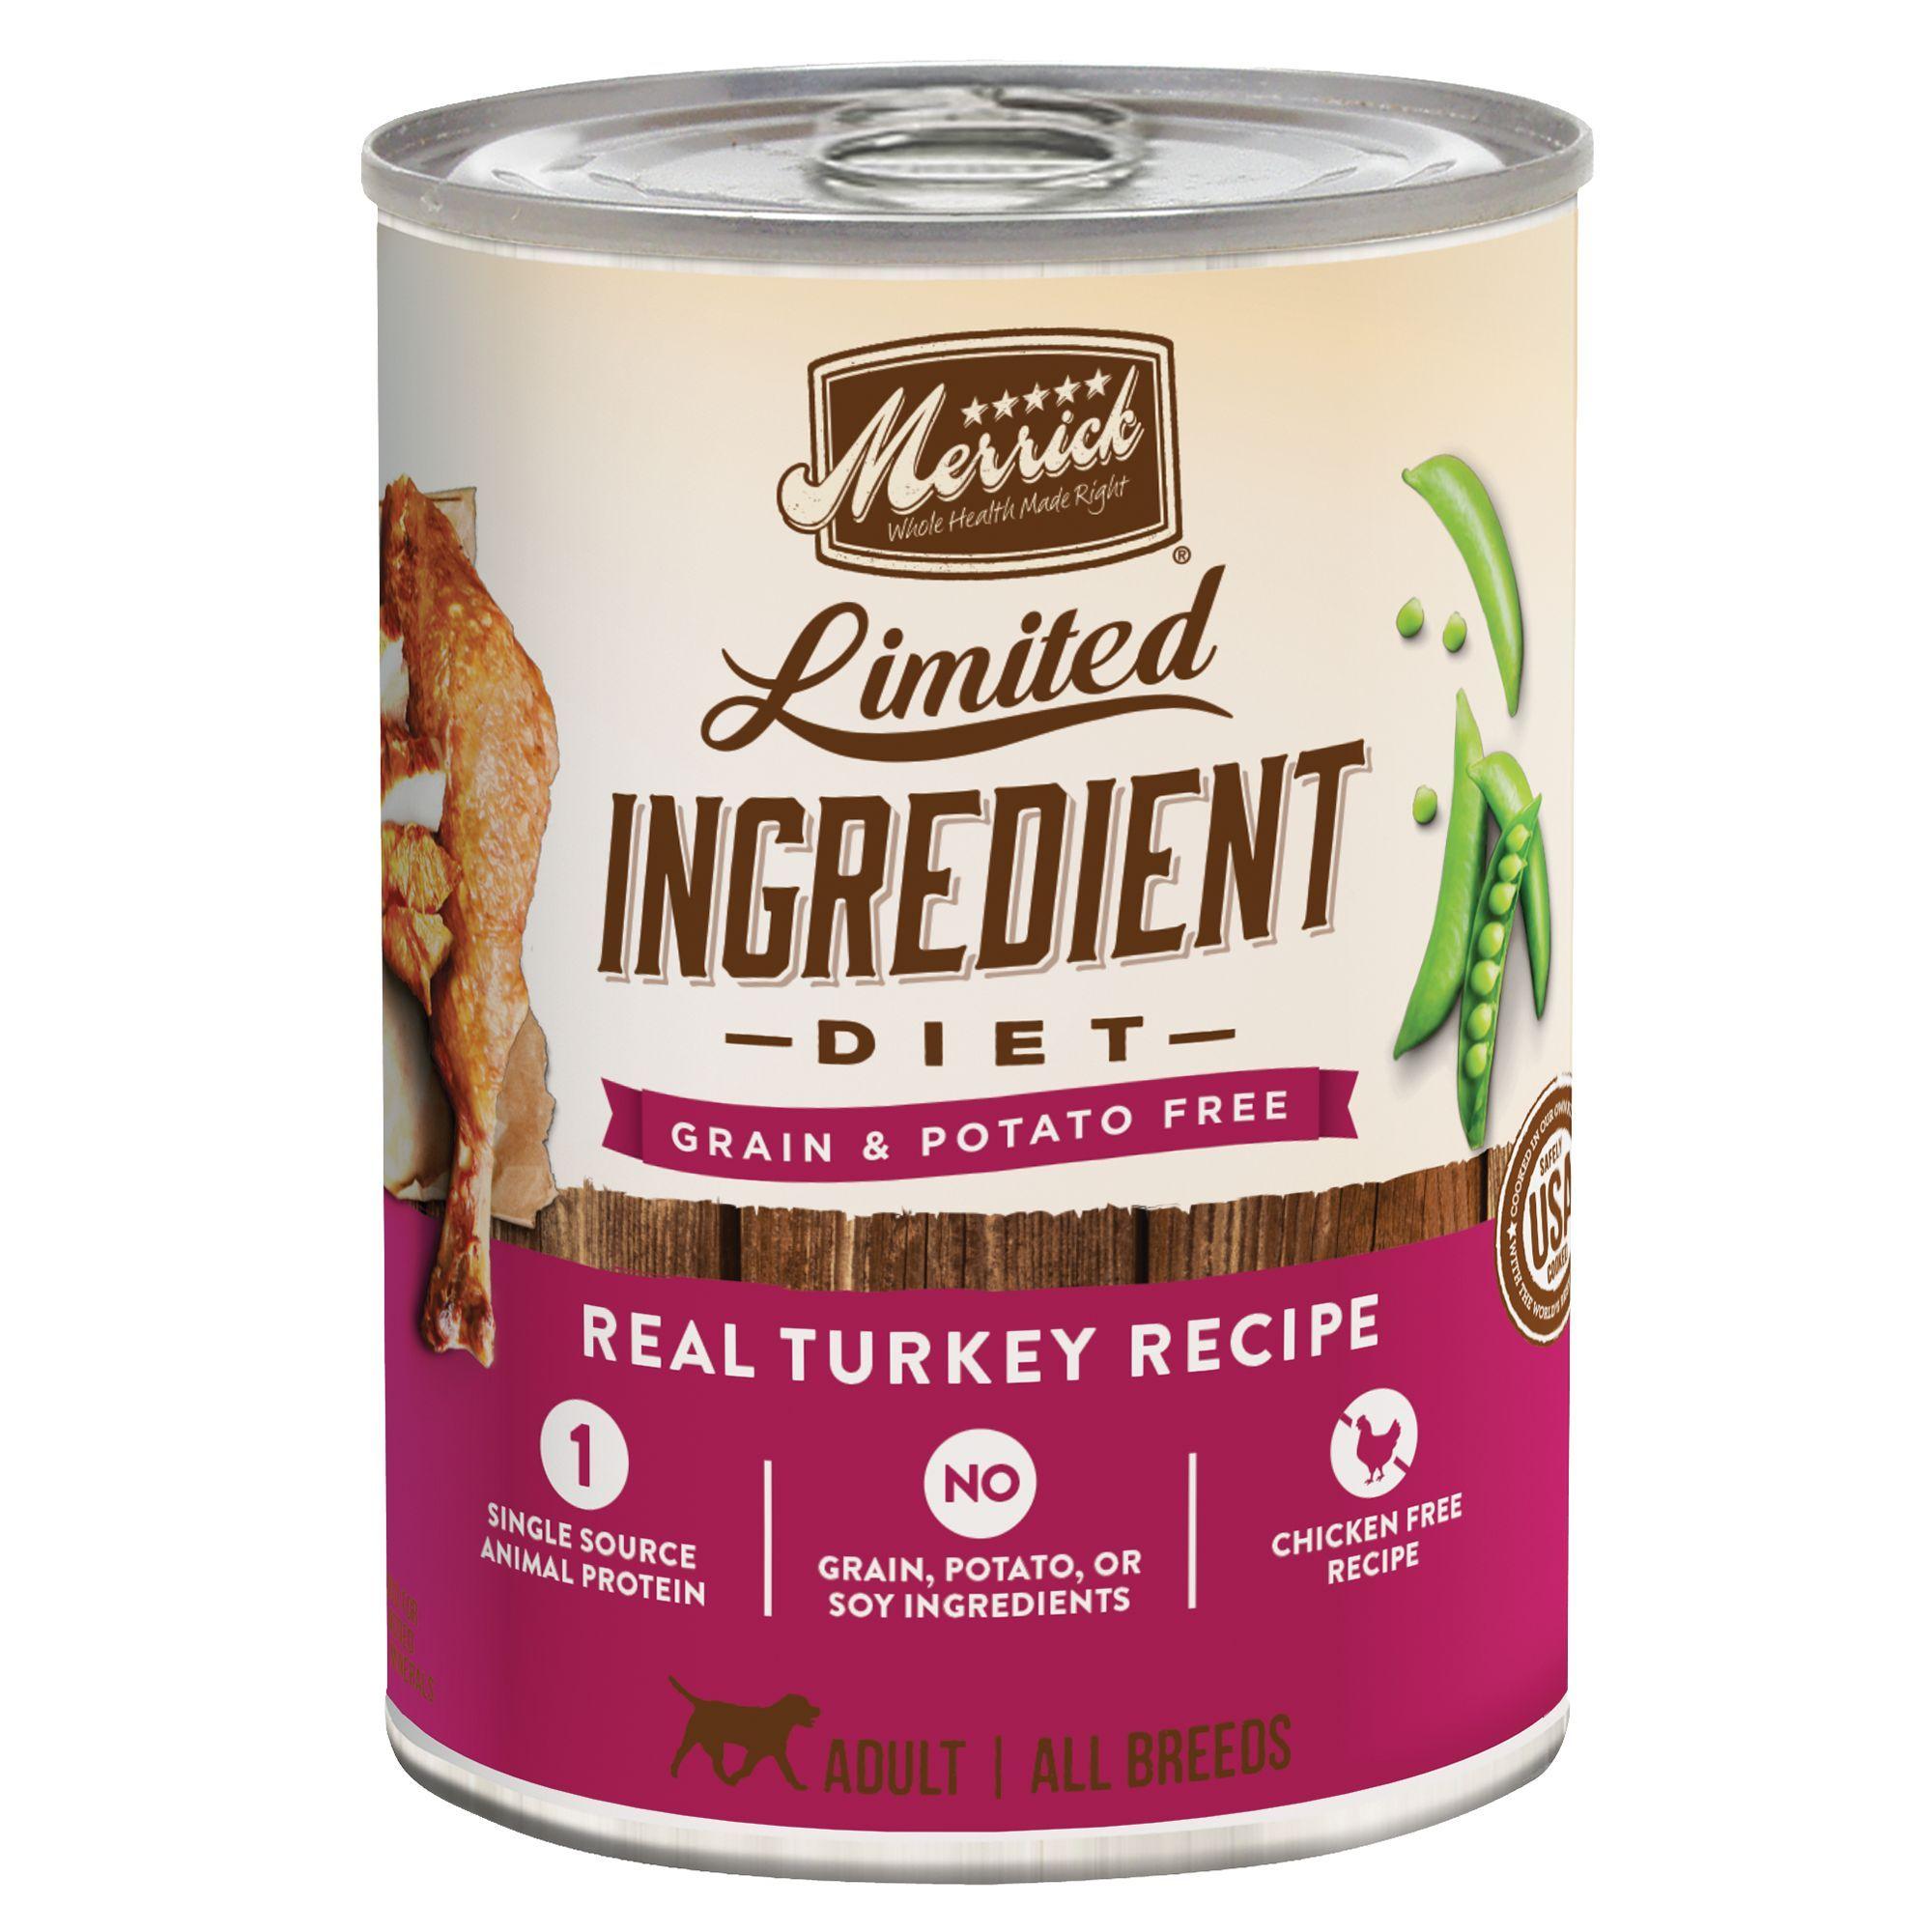 Merrick Limited Ingrediet Diet Adult Dog Food Natural Grain